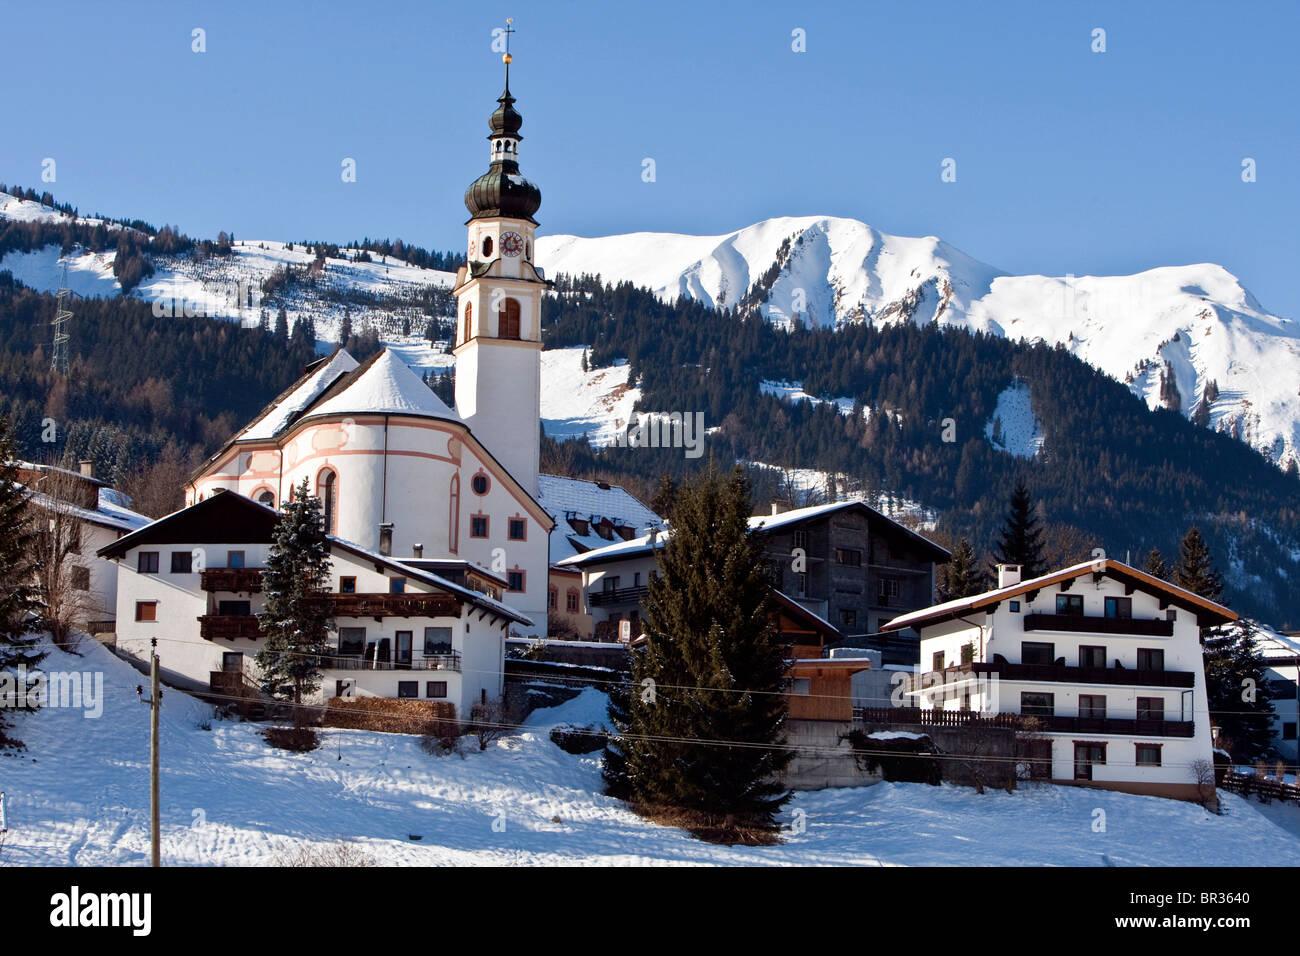 Village in winter, Lermoos, Zugspitz Arena, Tyrol, Austria, Europe - Stock Image